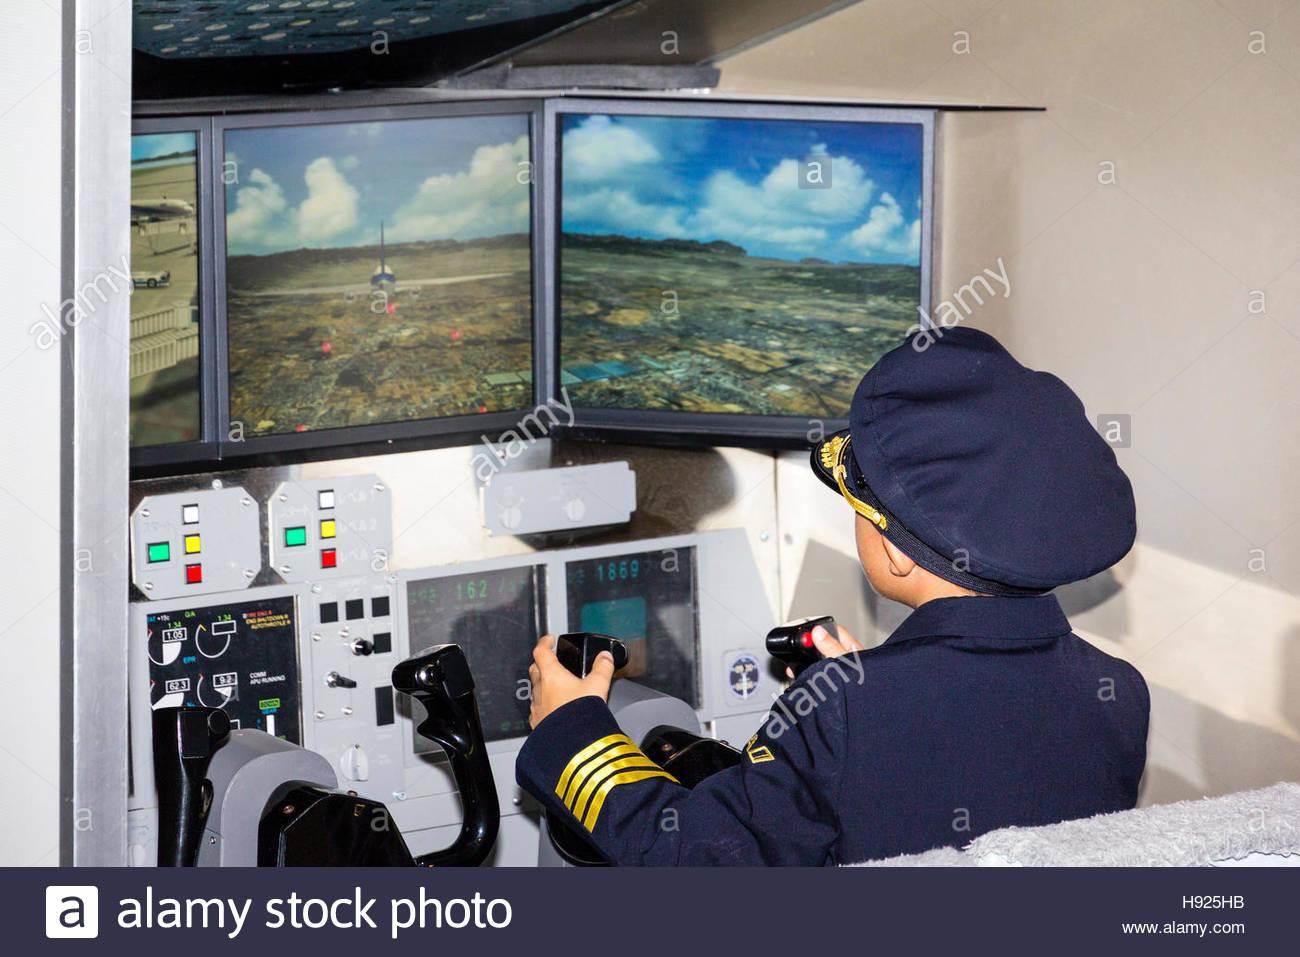 Click image for larger version.  Name:japan-nishinomiya-kidzania-ana-flight-simulators-with-boy-child-in-H925HB.jpg Views:43 Size:151.8 KB ID:25492